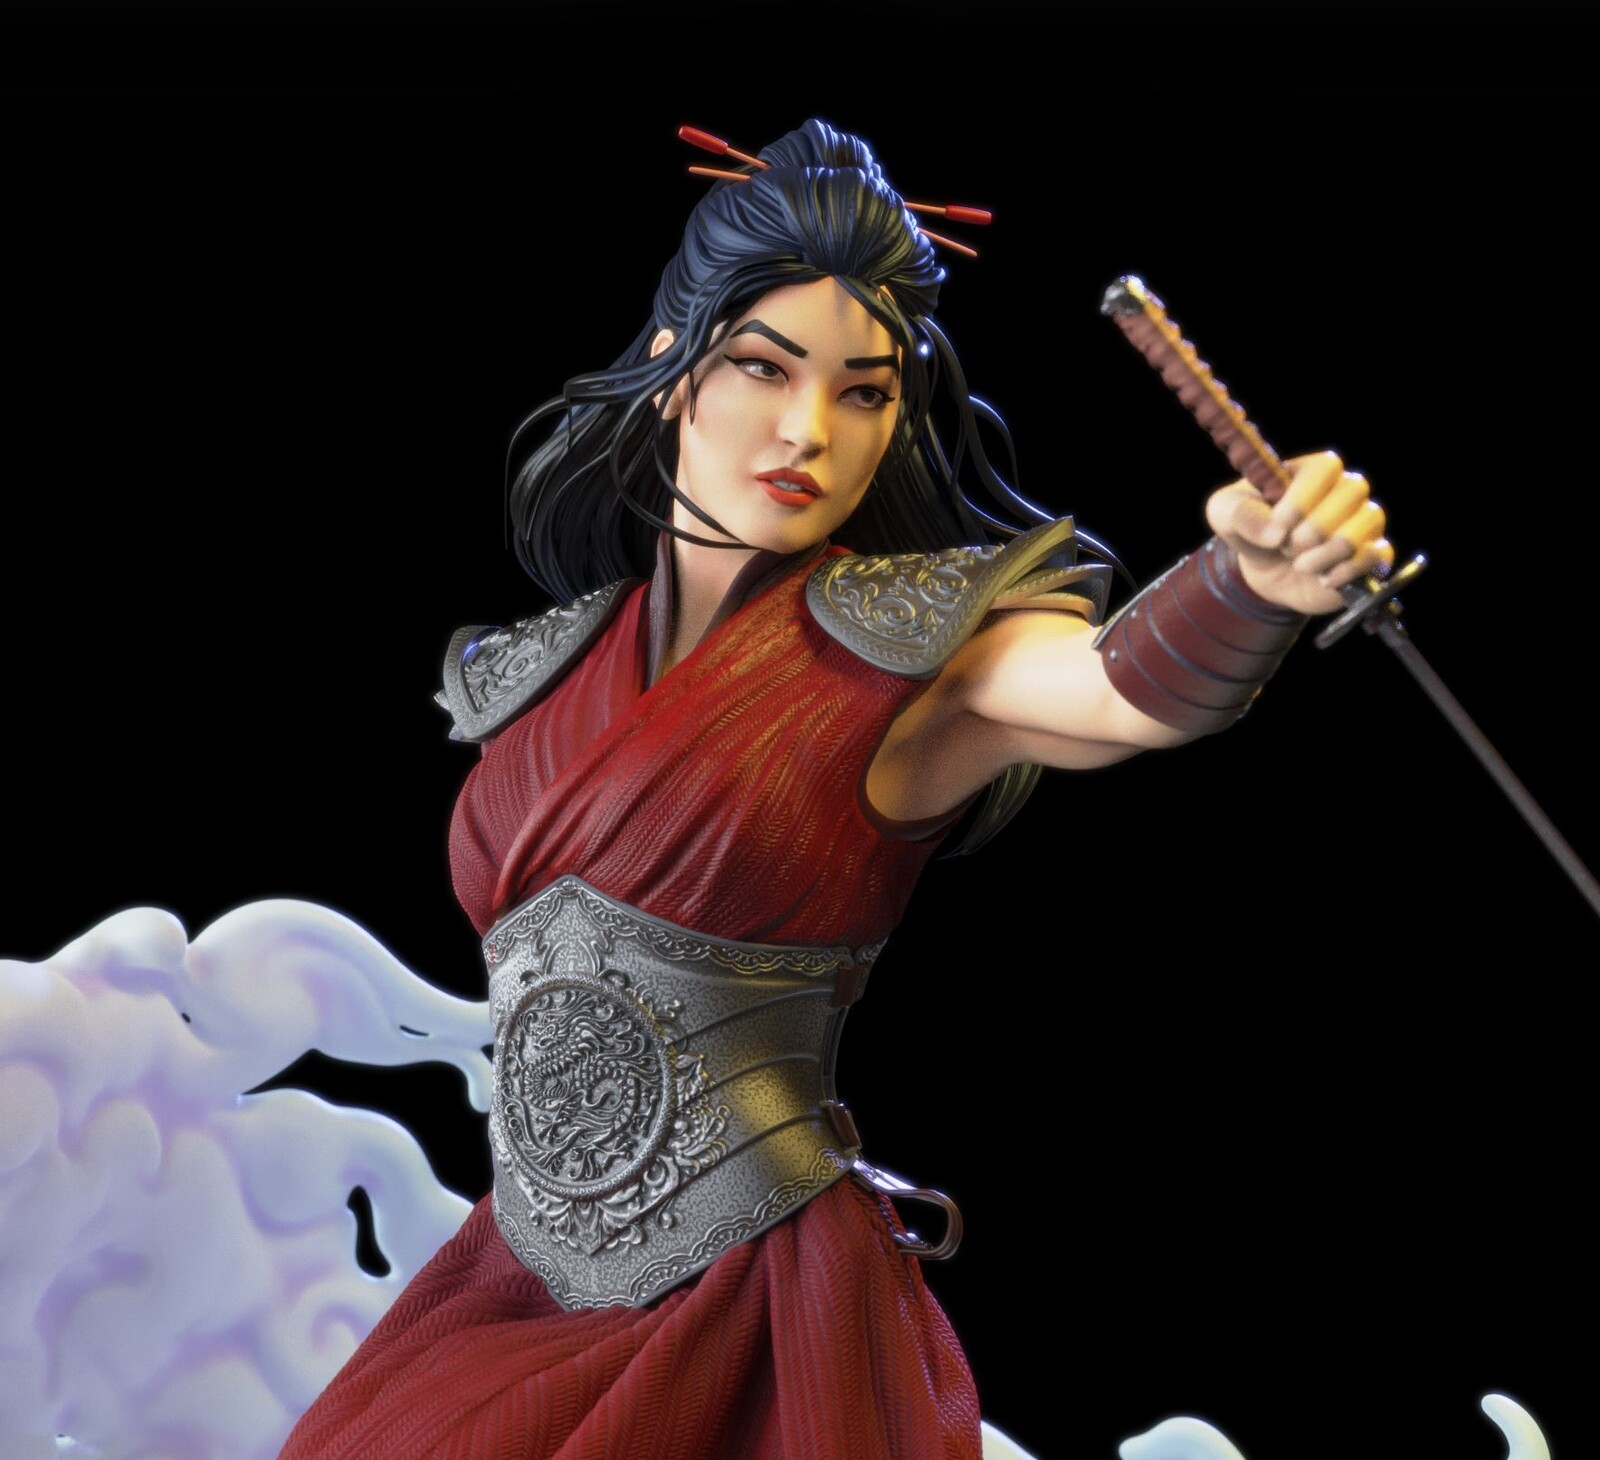 The Ninth Samurai